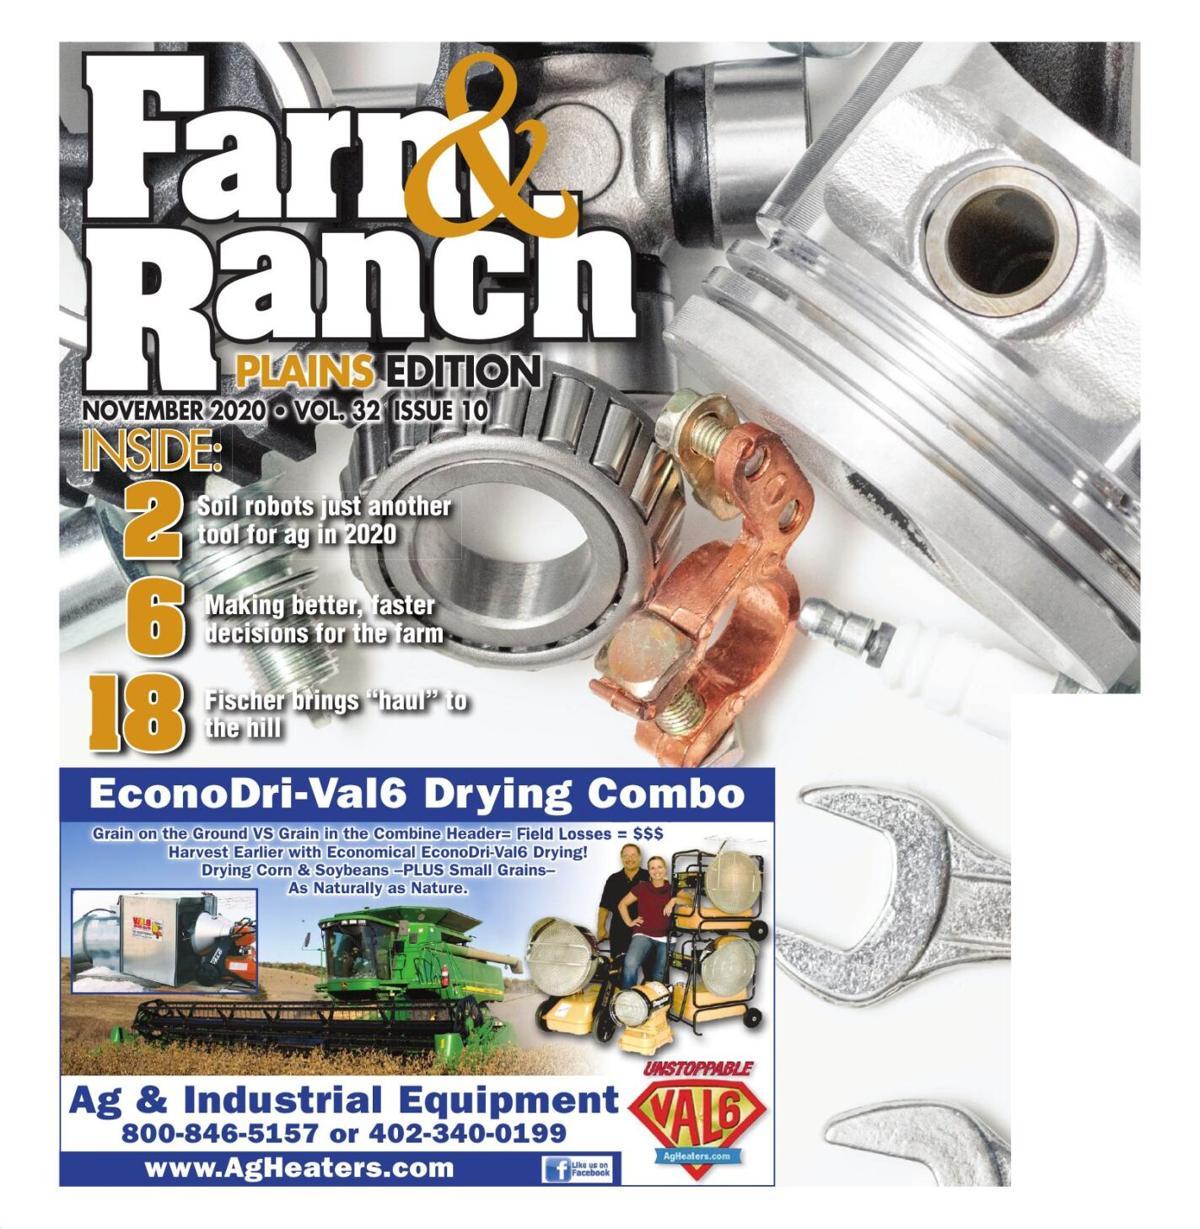 Farm & Ranch Plains Edition November 2020